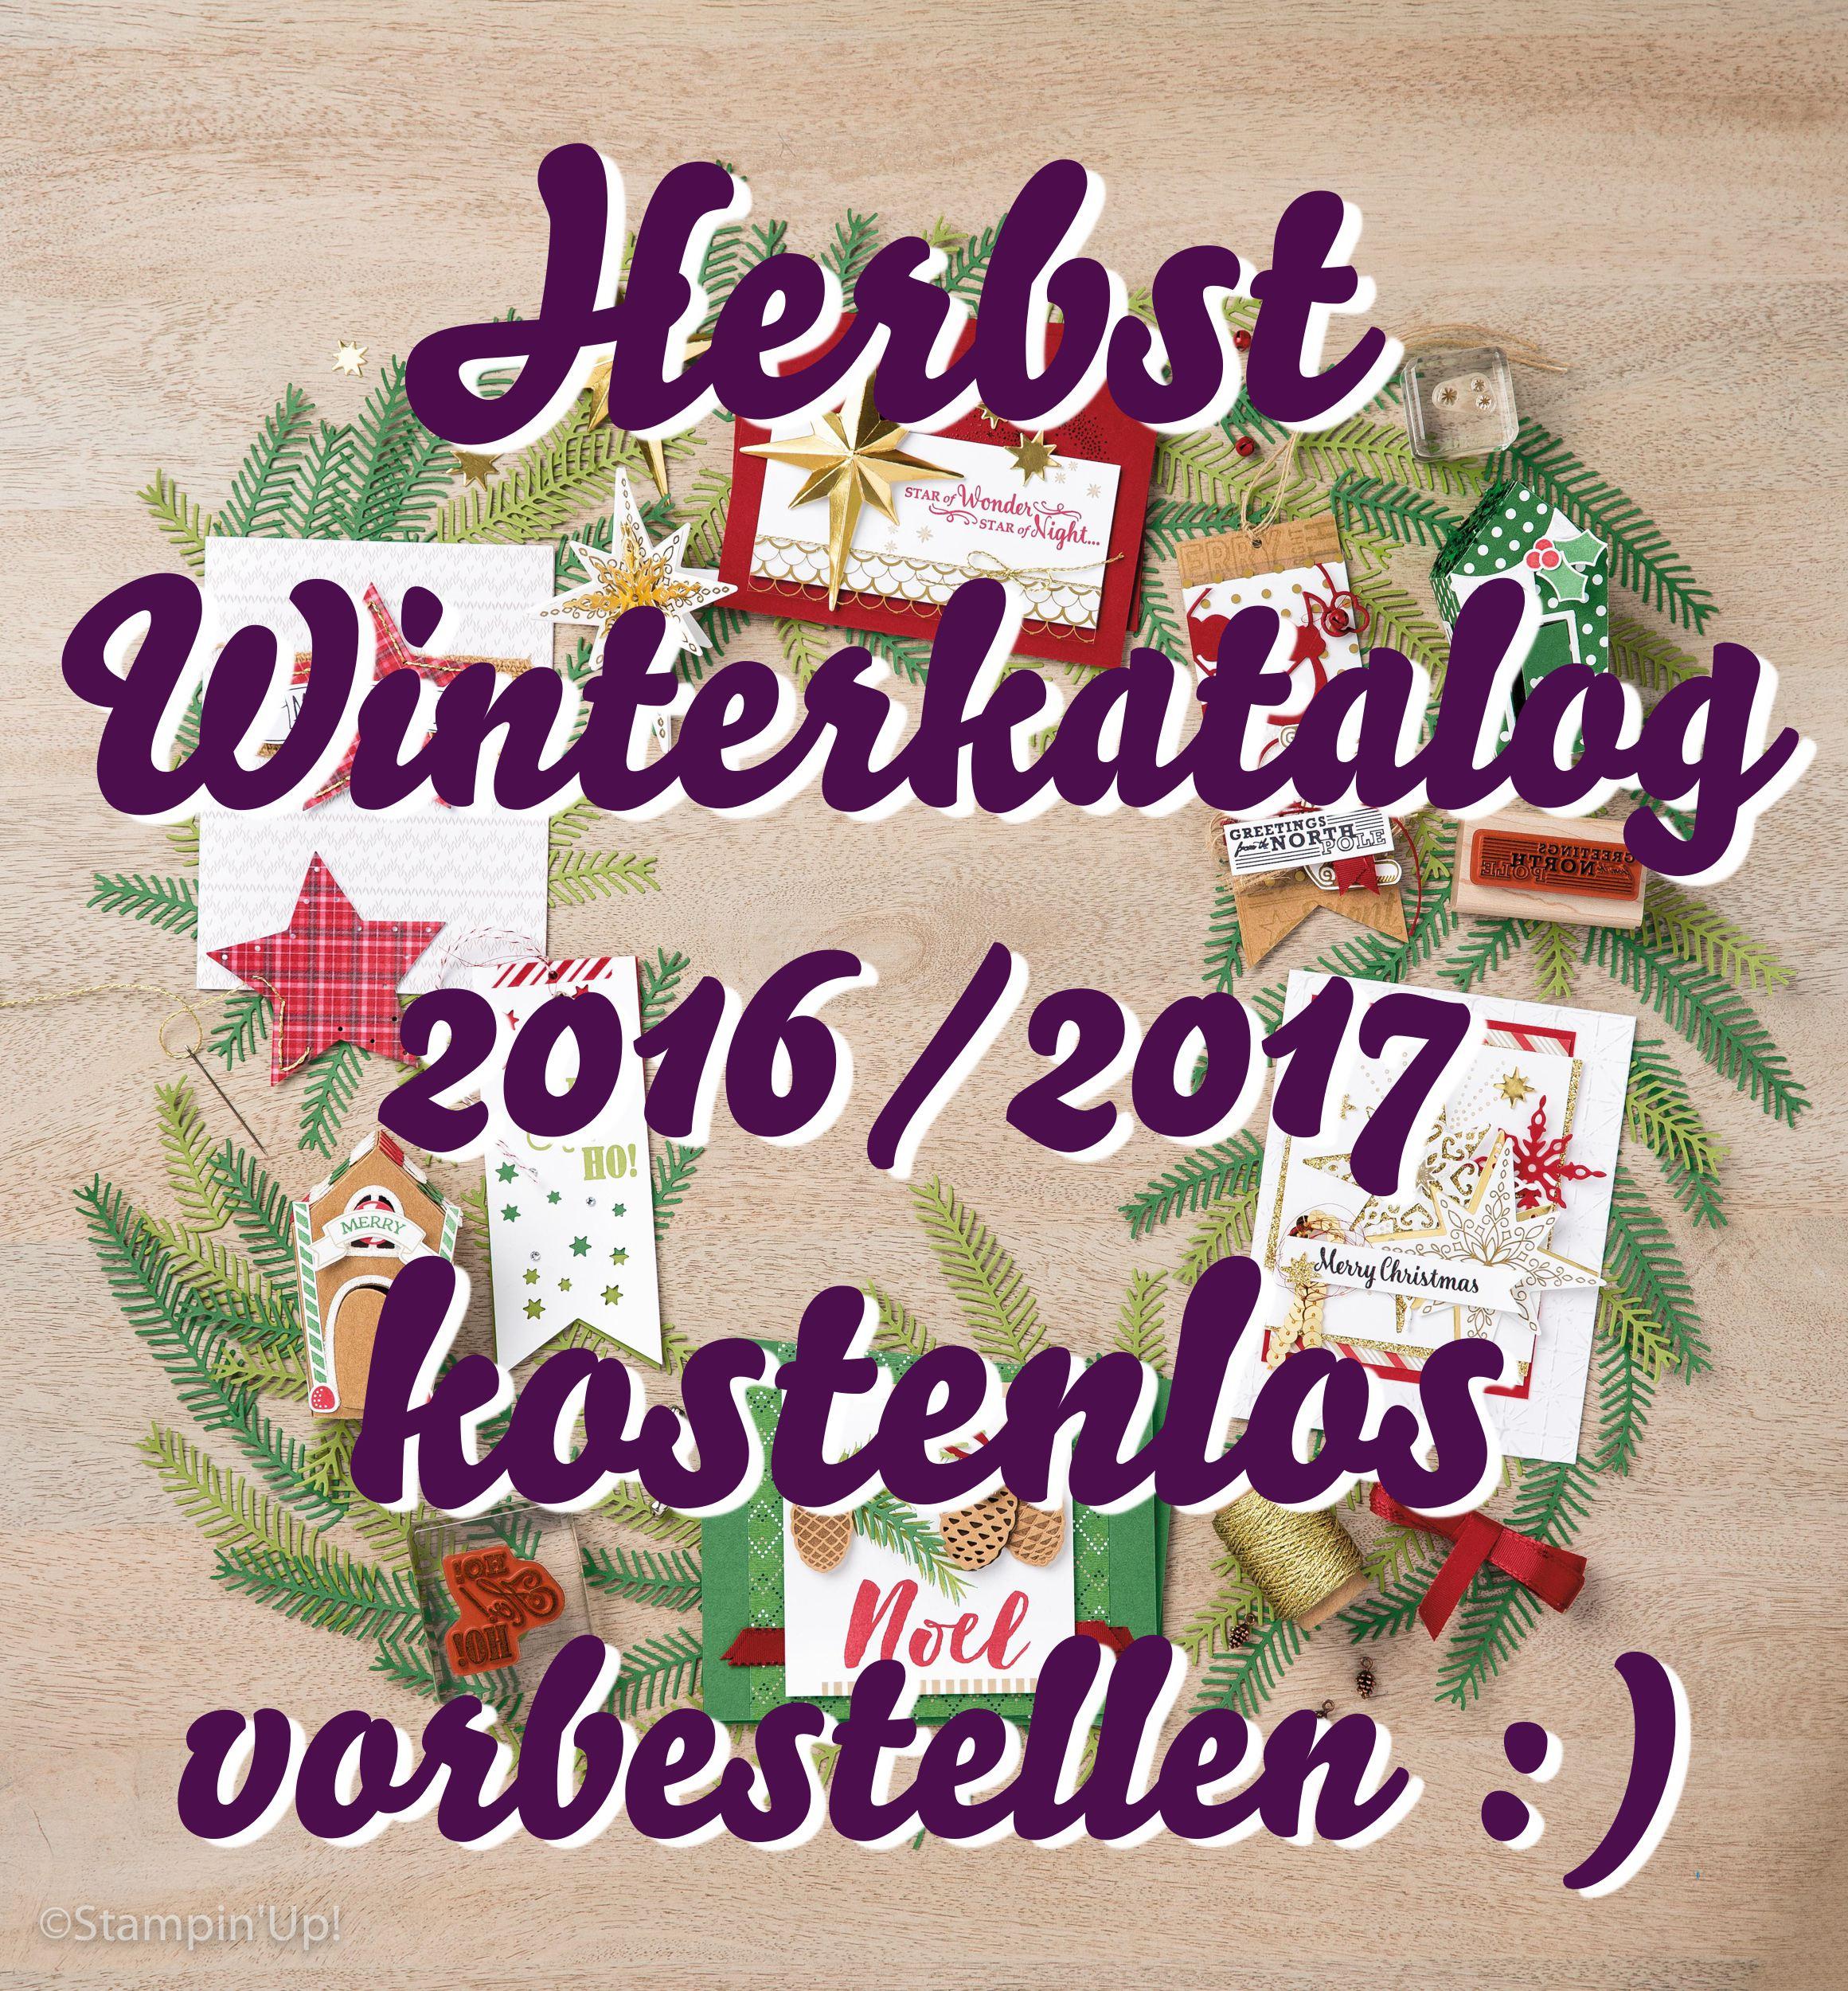 Stampin' Up! Herbst / Winterkatalog 2016 – 2017 bestellen